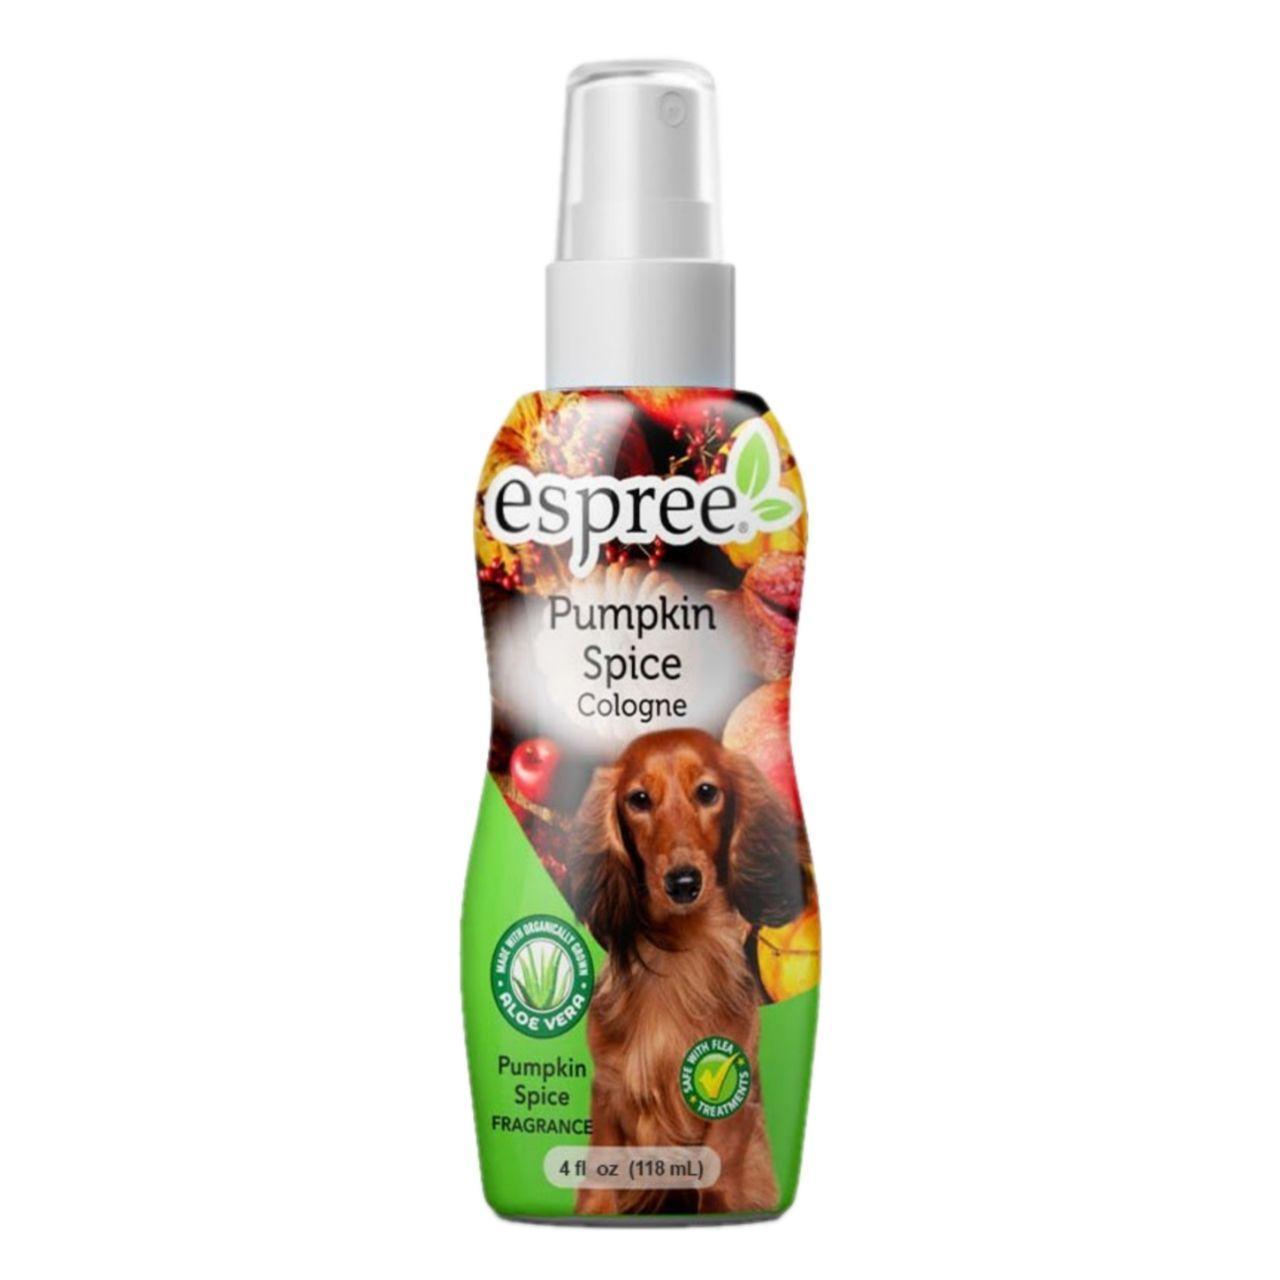 Espree Pumpkin Spice Cologne – одеколон з ароматом духмяного гарбуза для собак